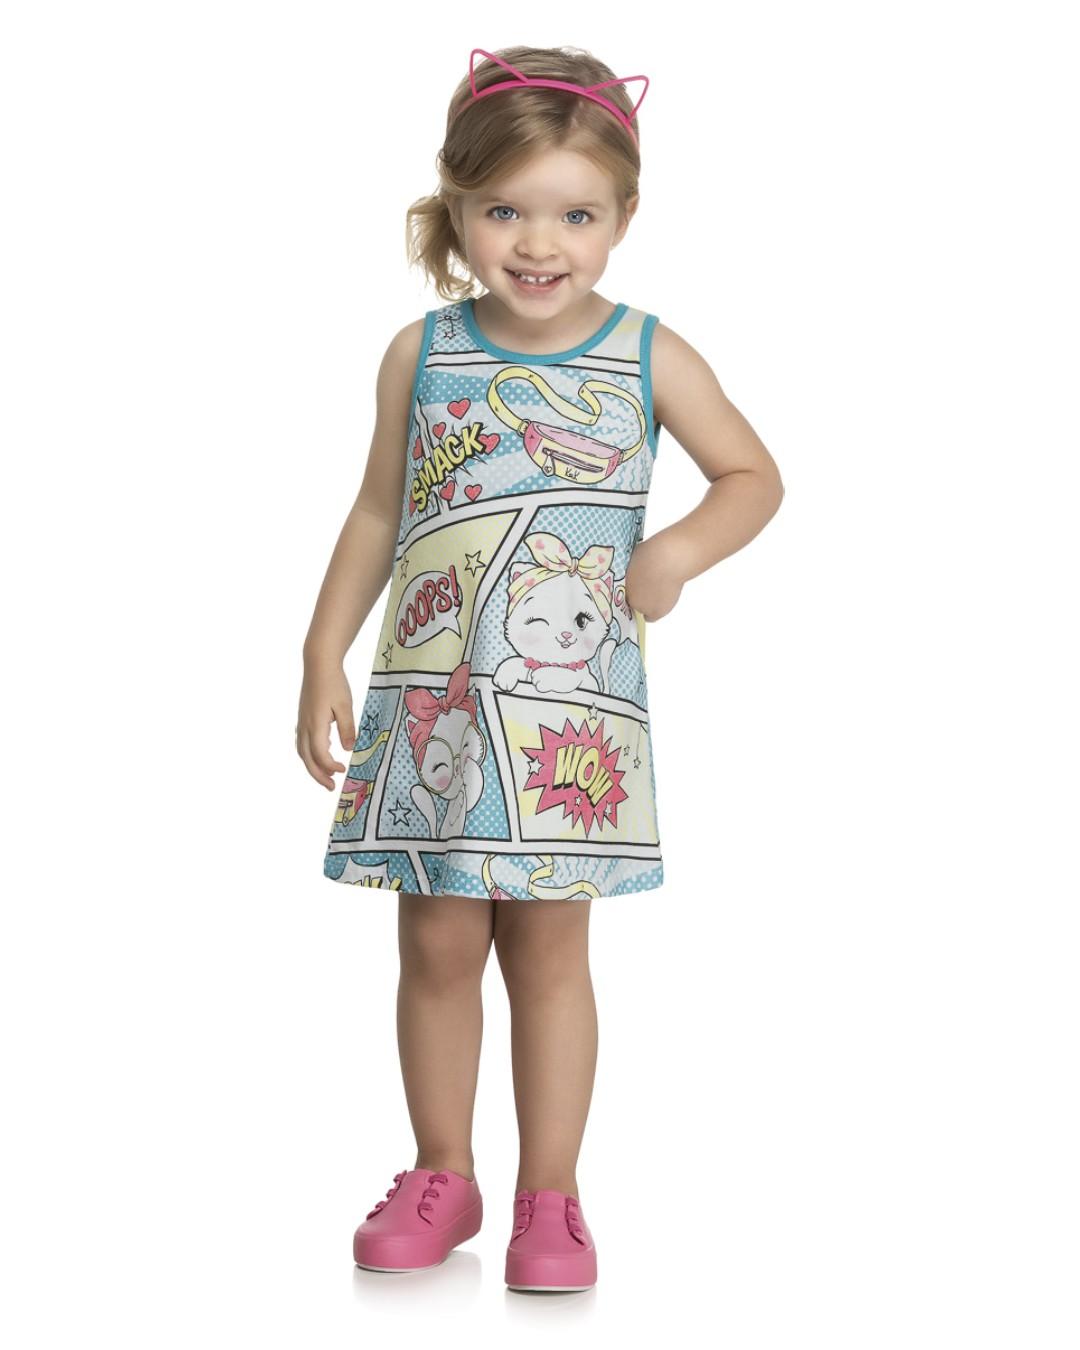 Vestido Infantil Quadrinhos Smack - Kely & Kety